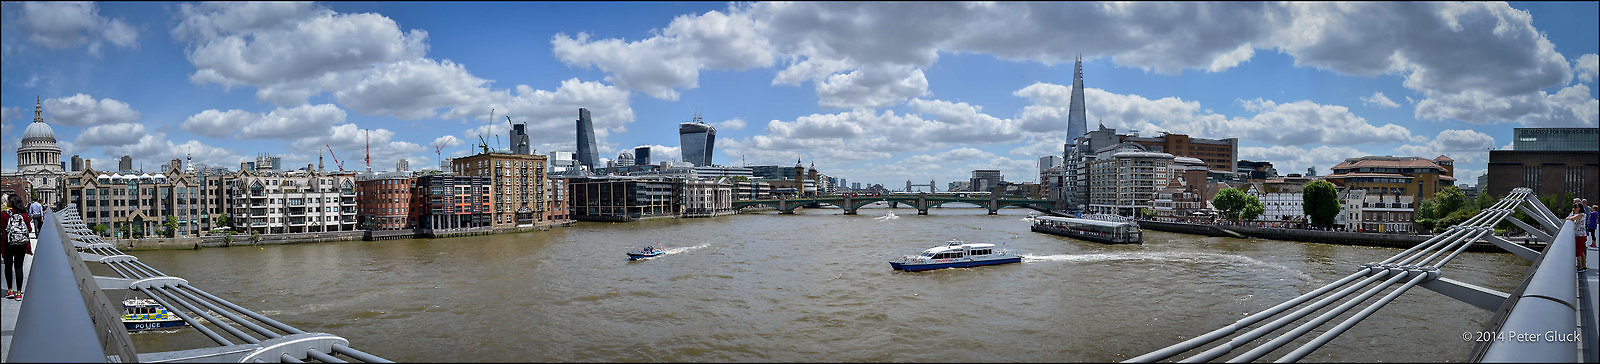 London 2014 06 10 PG 169